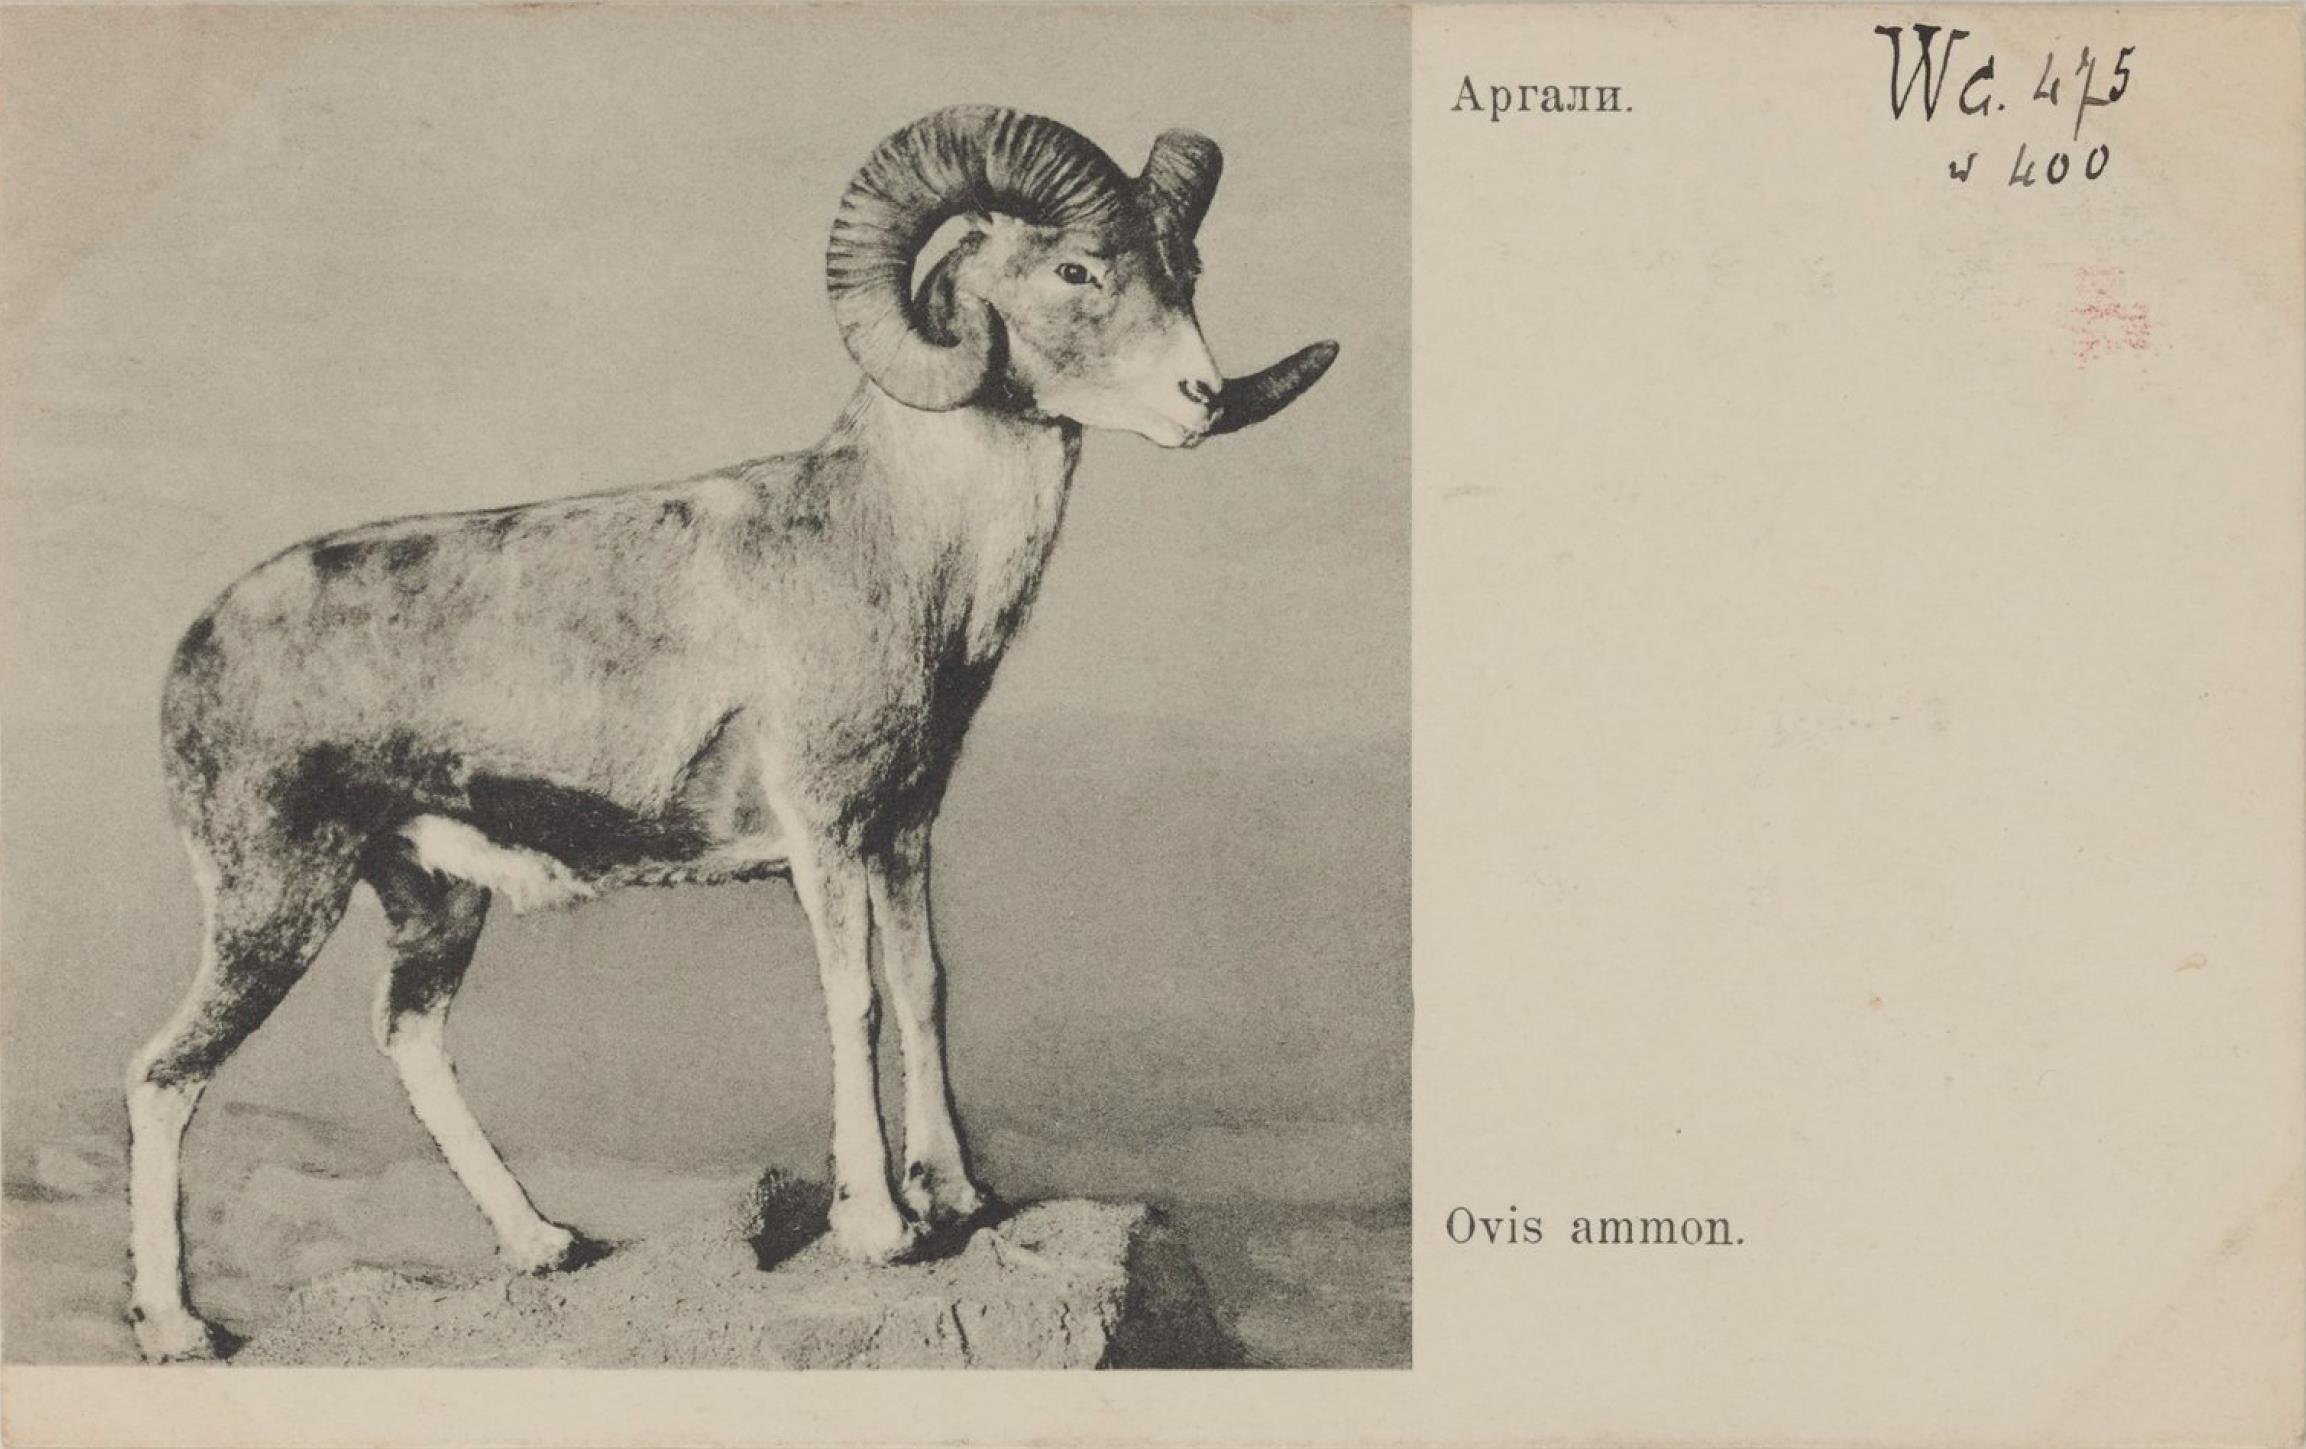 Академия Наук. Зоологический музей. Аргали